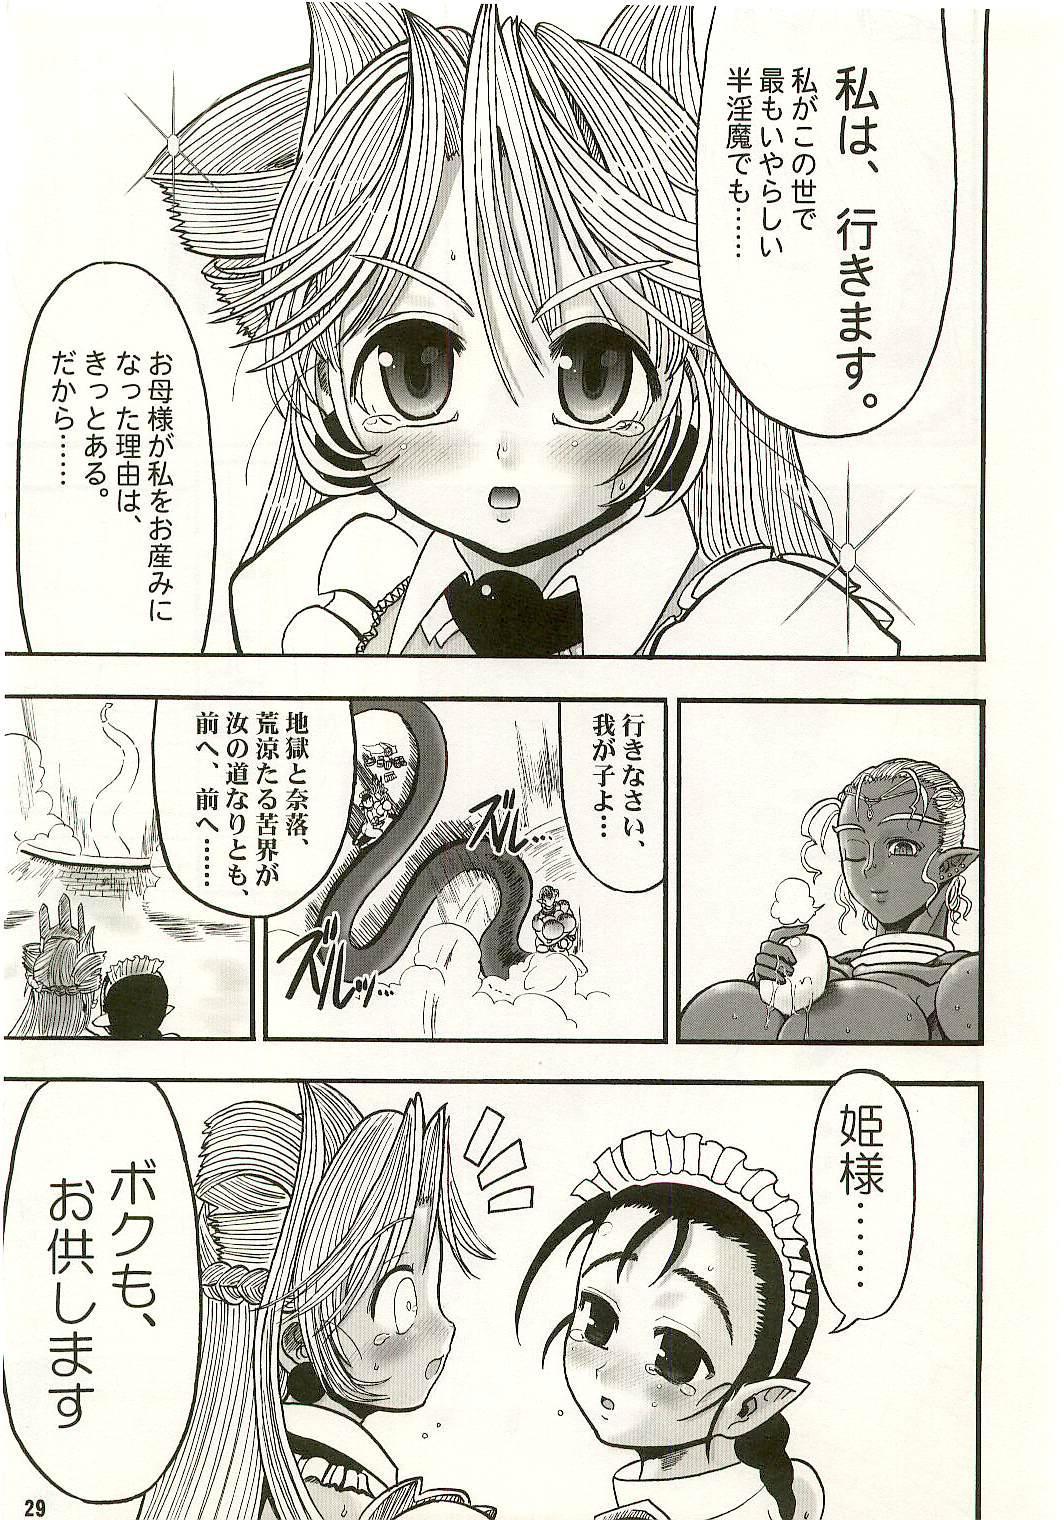 TGWOA Vol.17 - Meikyuu Oujo Prina 3 26